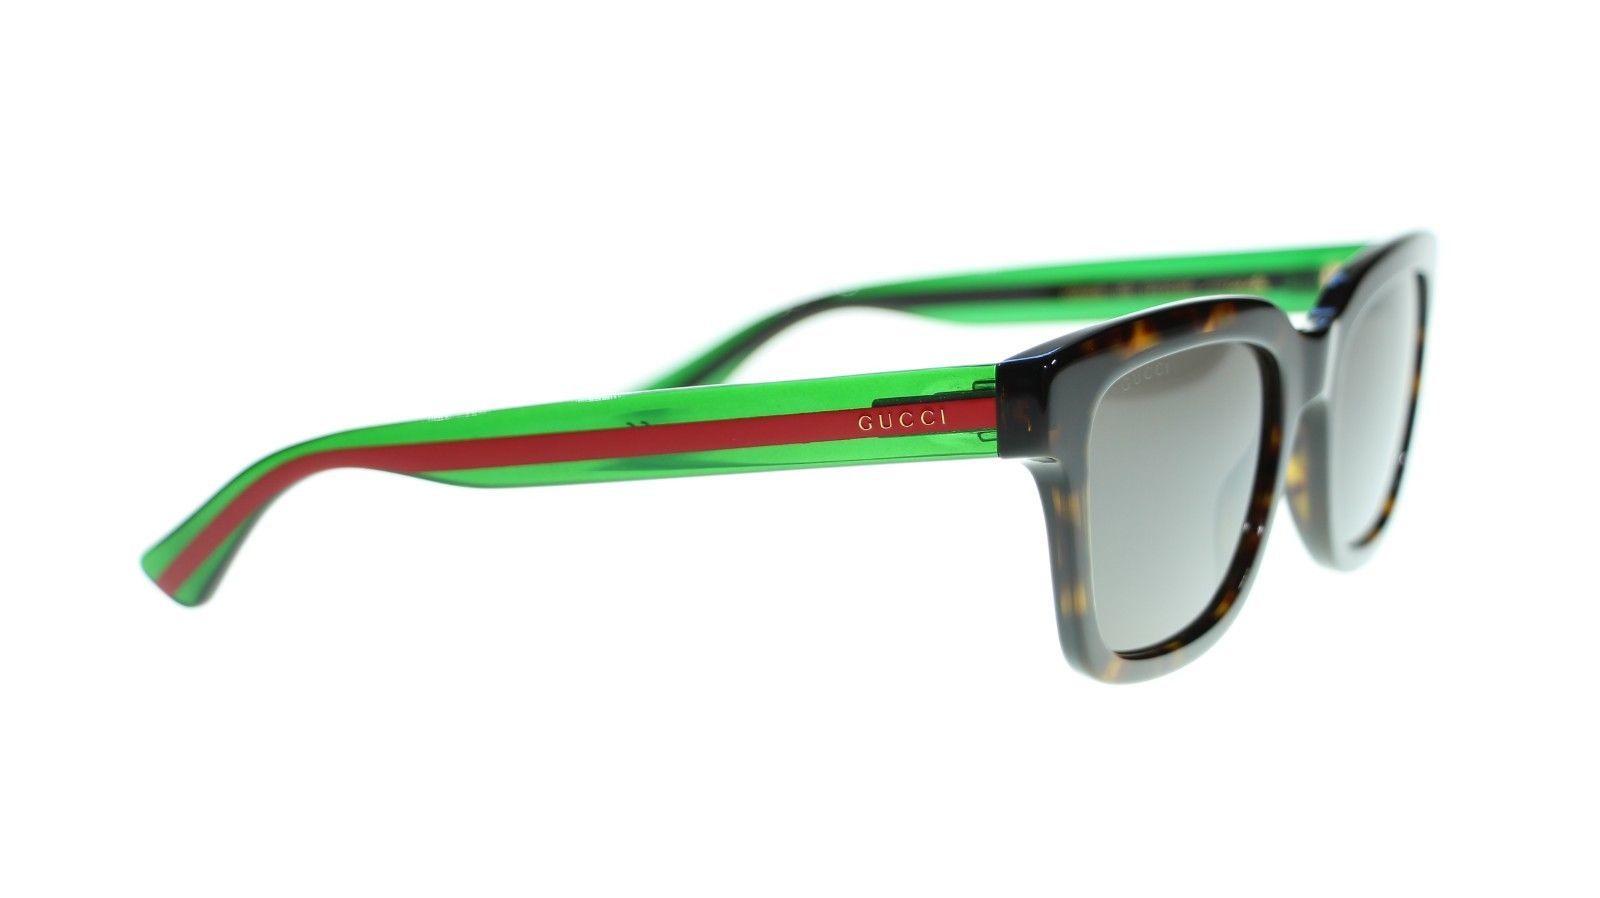 9c943321d766e Gucci Men Square Sunglasses GG0001S 003 Havana Green Grey Lens 52mm  Authentic